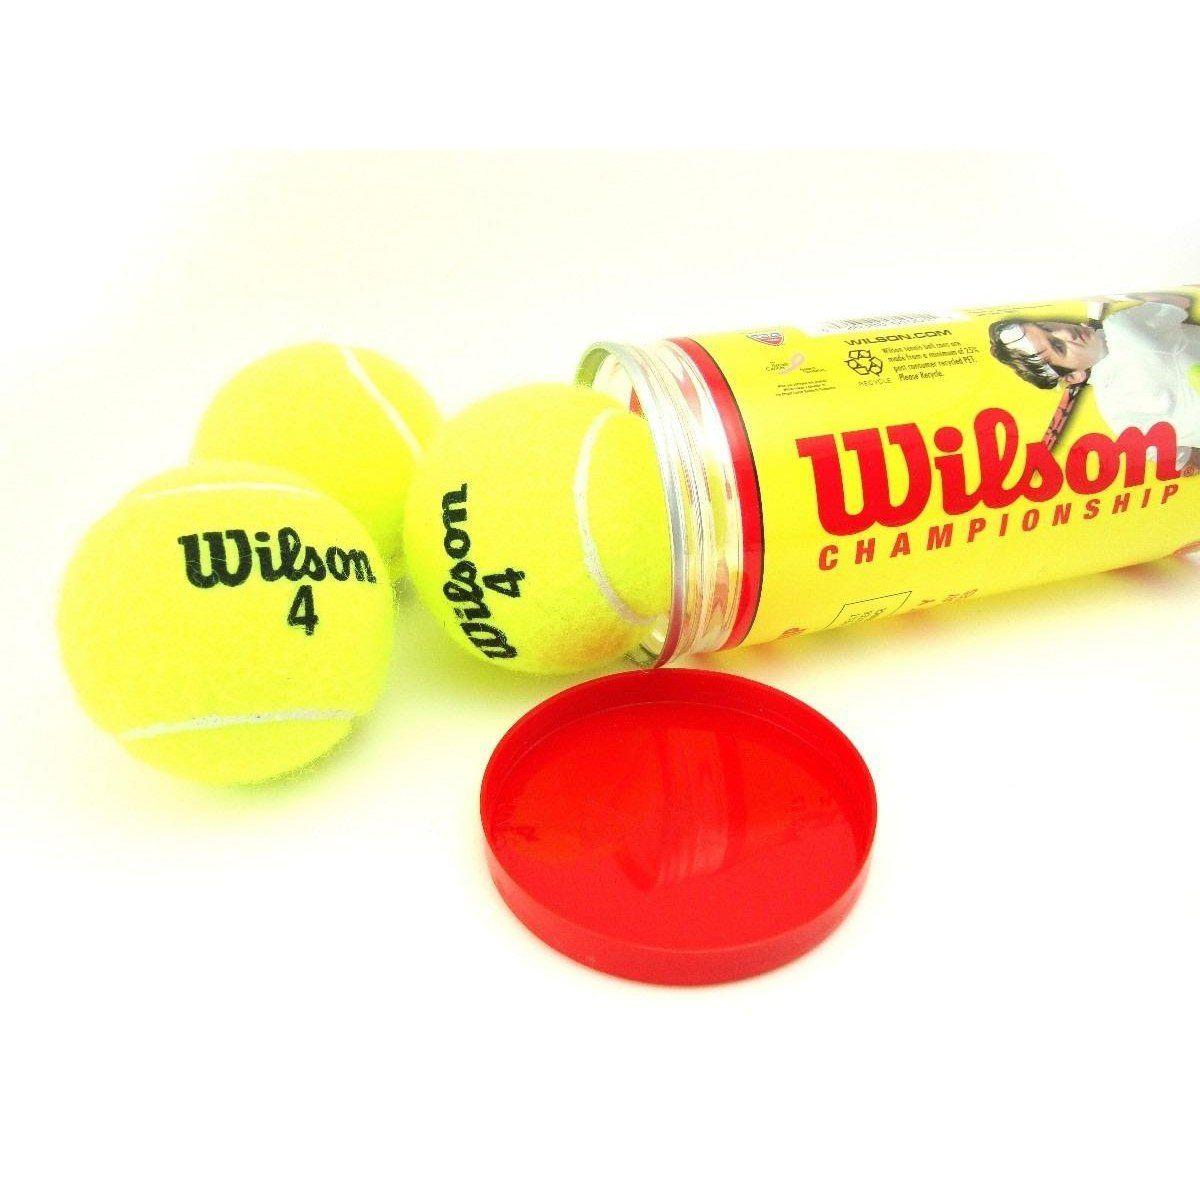 Bola De Tênis Wilson Championship Extra Duty